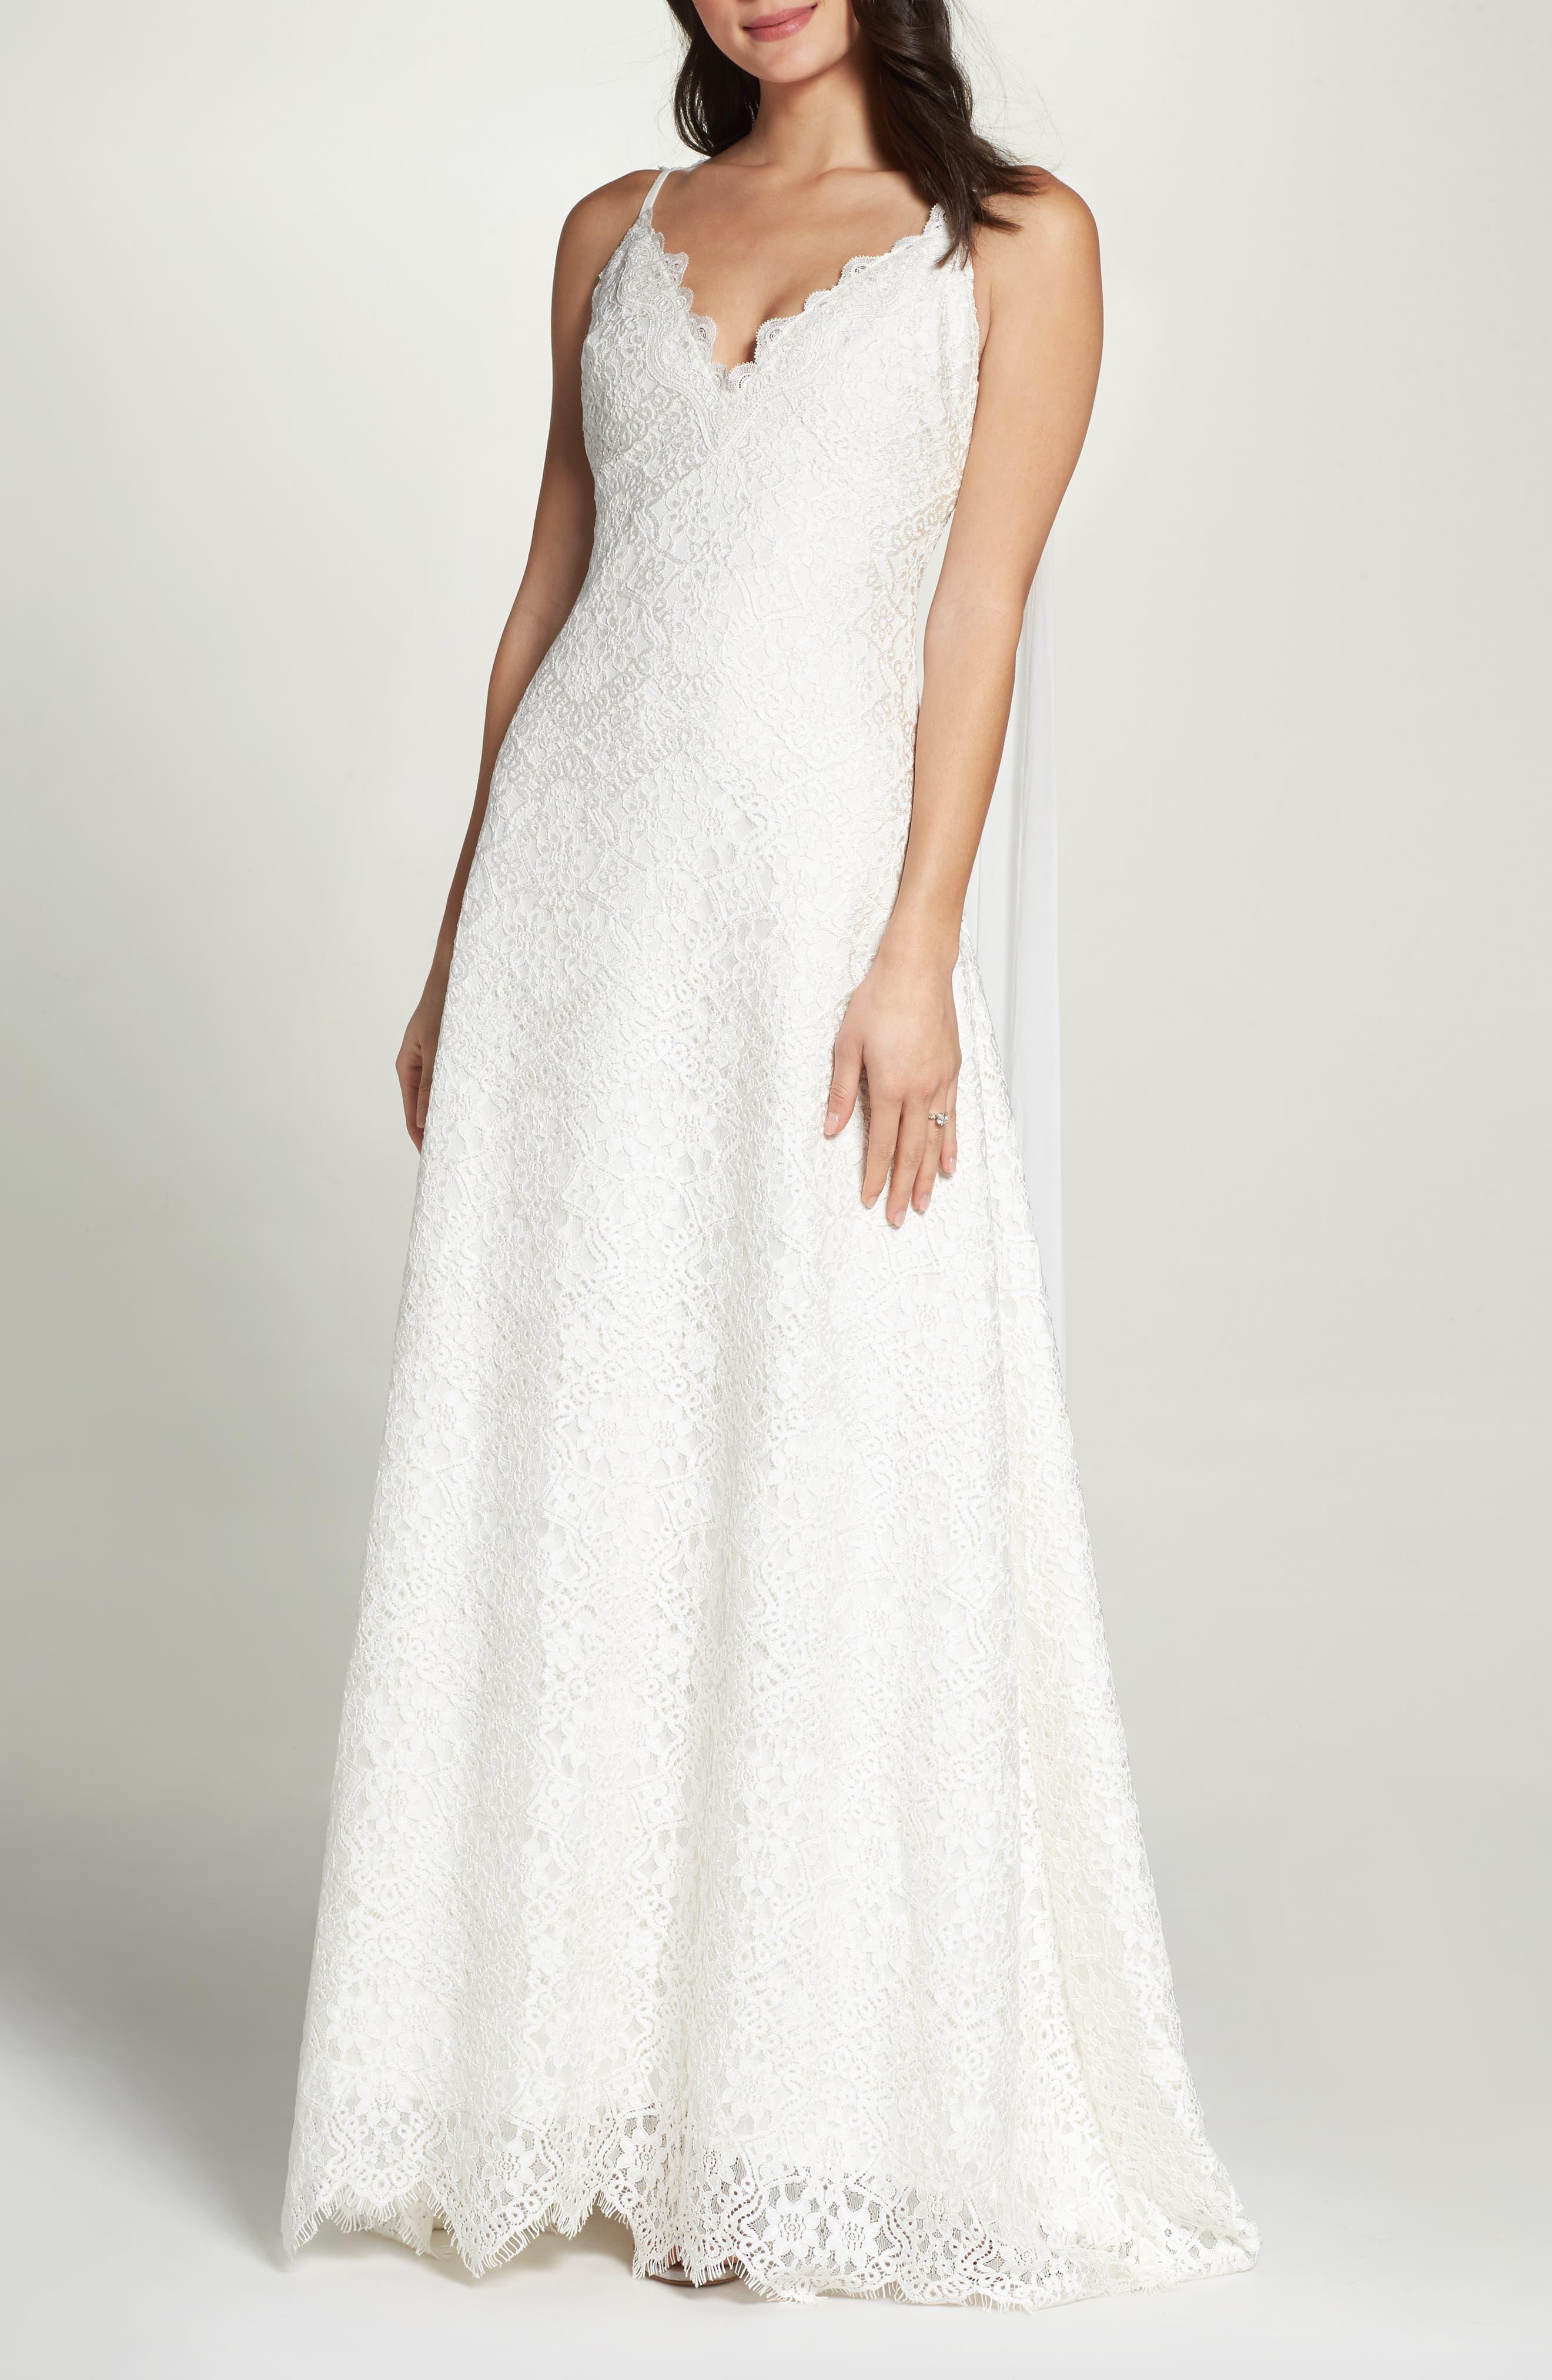 Chiffon Sash Scalloped Lace Gown,                             Main thumbnail 1, color,                             900